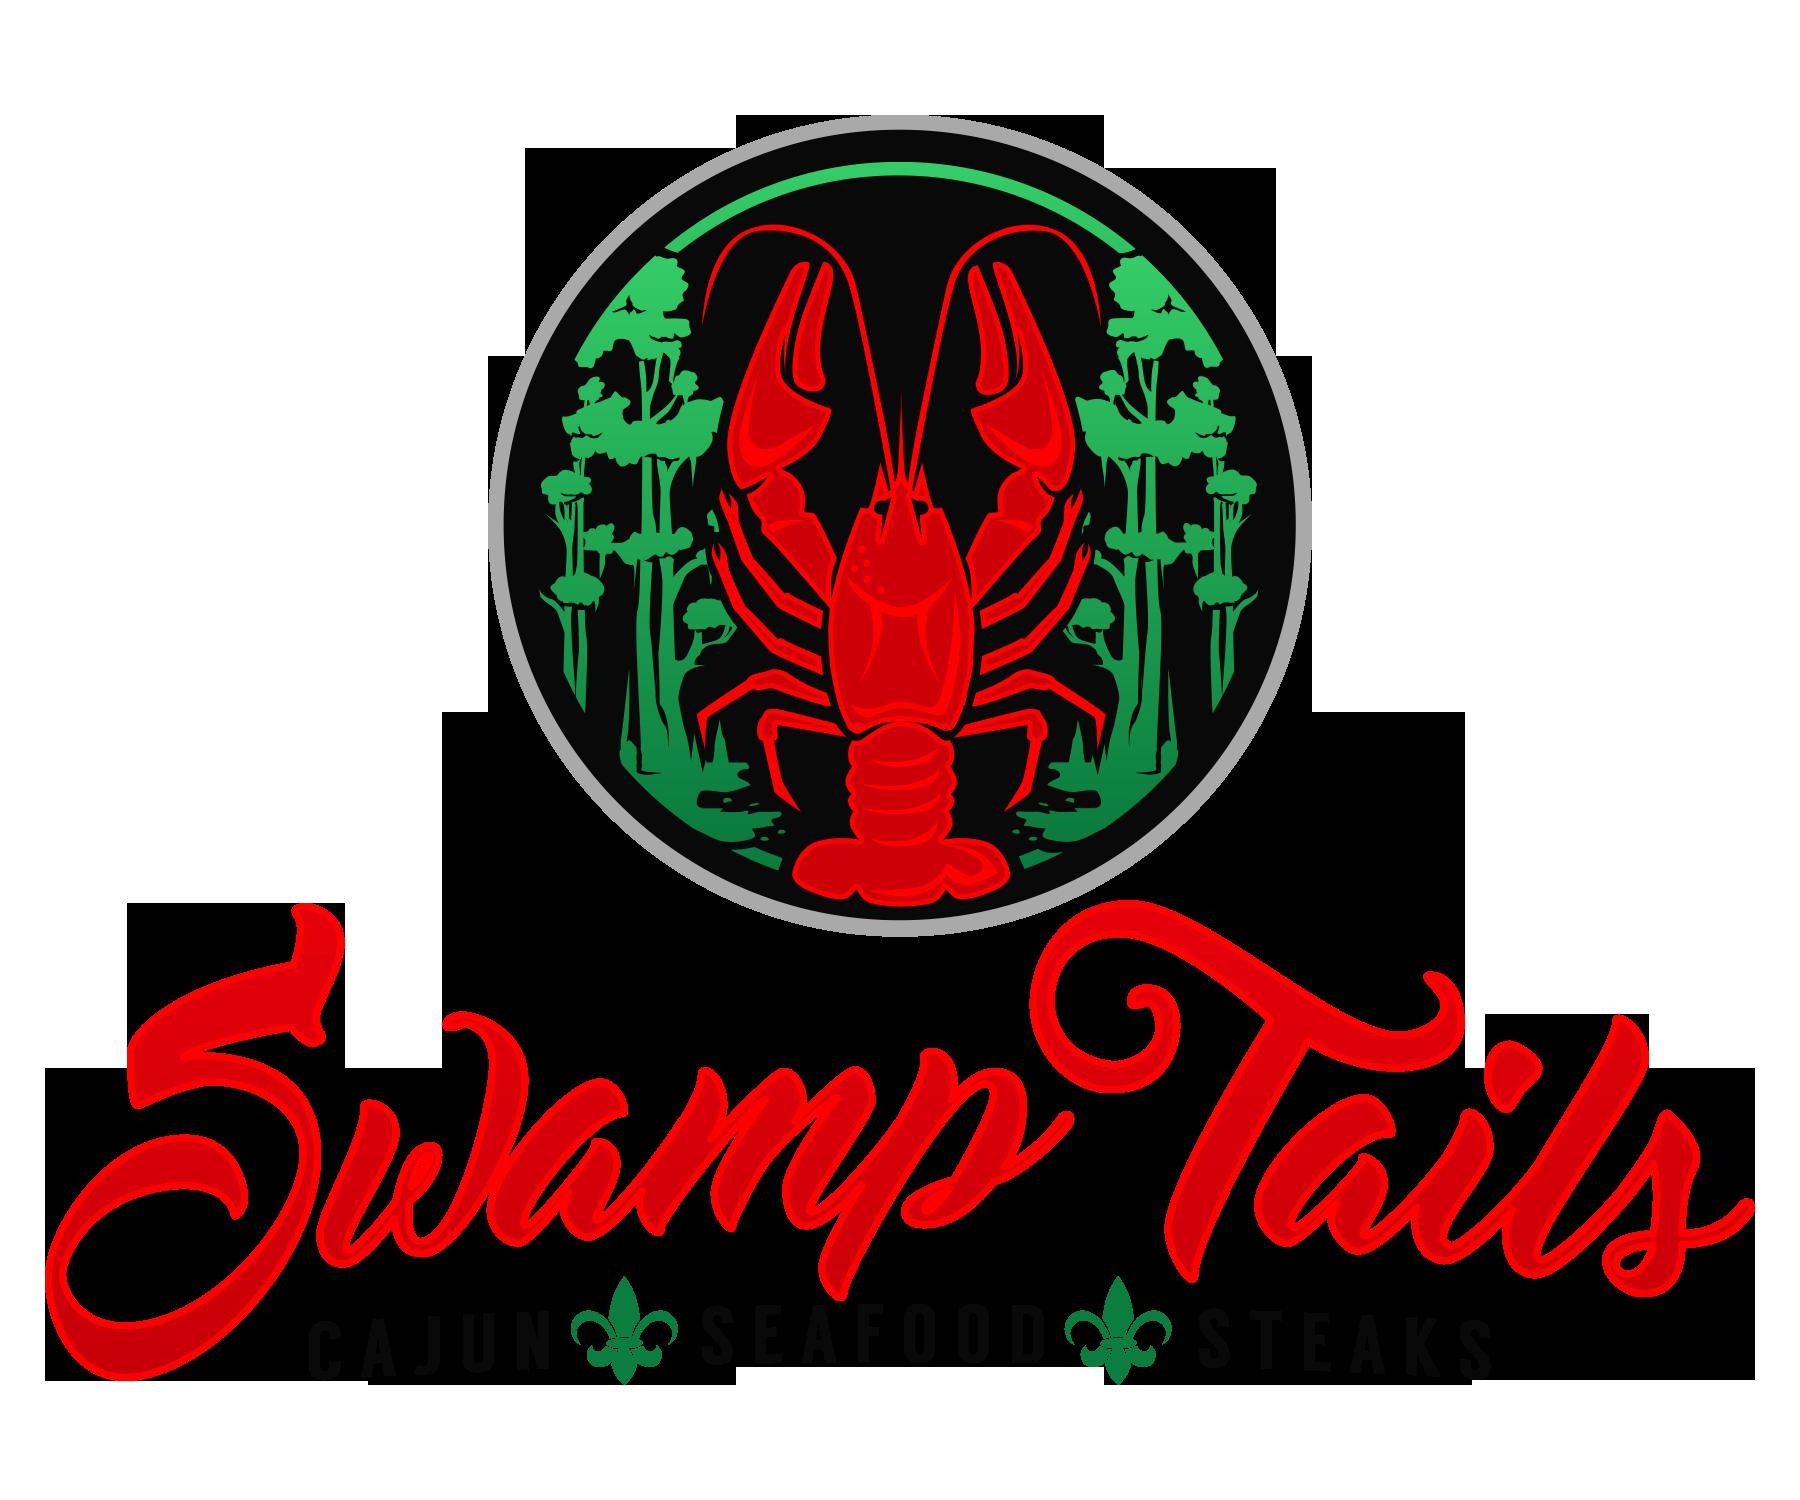 Create a fun, intriguing logo for a new Cajun, Seafood, & Steak restaurant called SwampTails